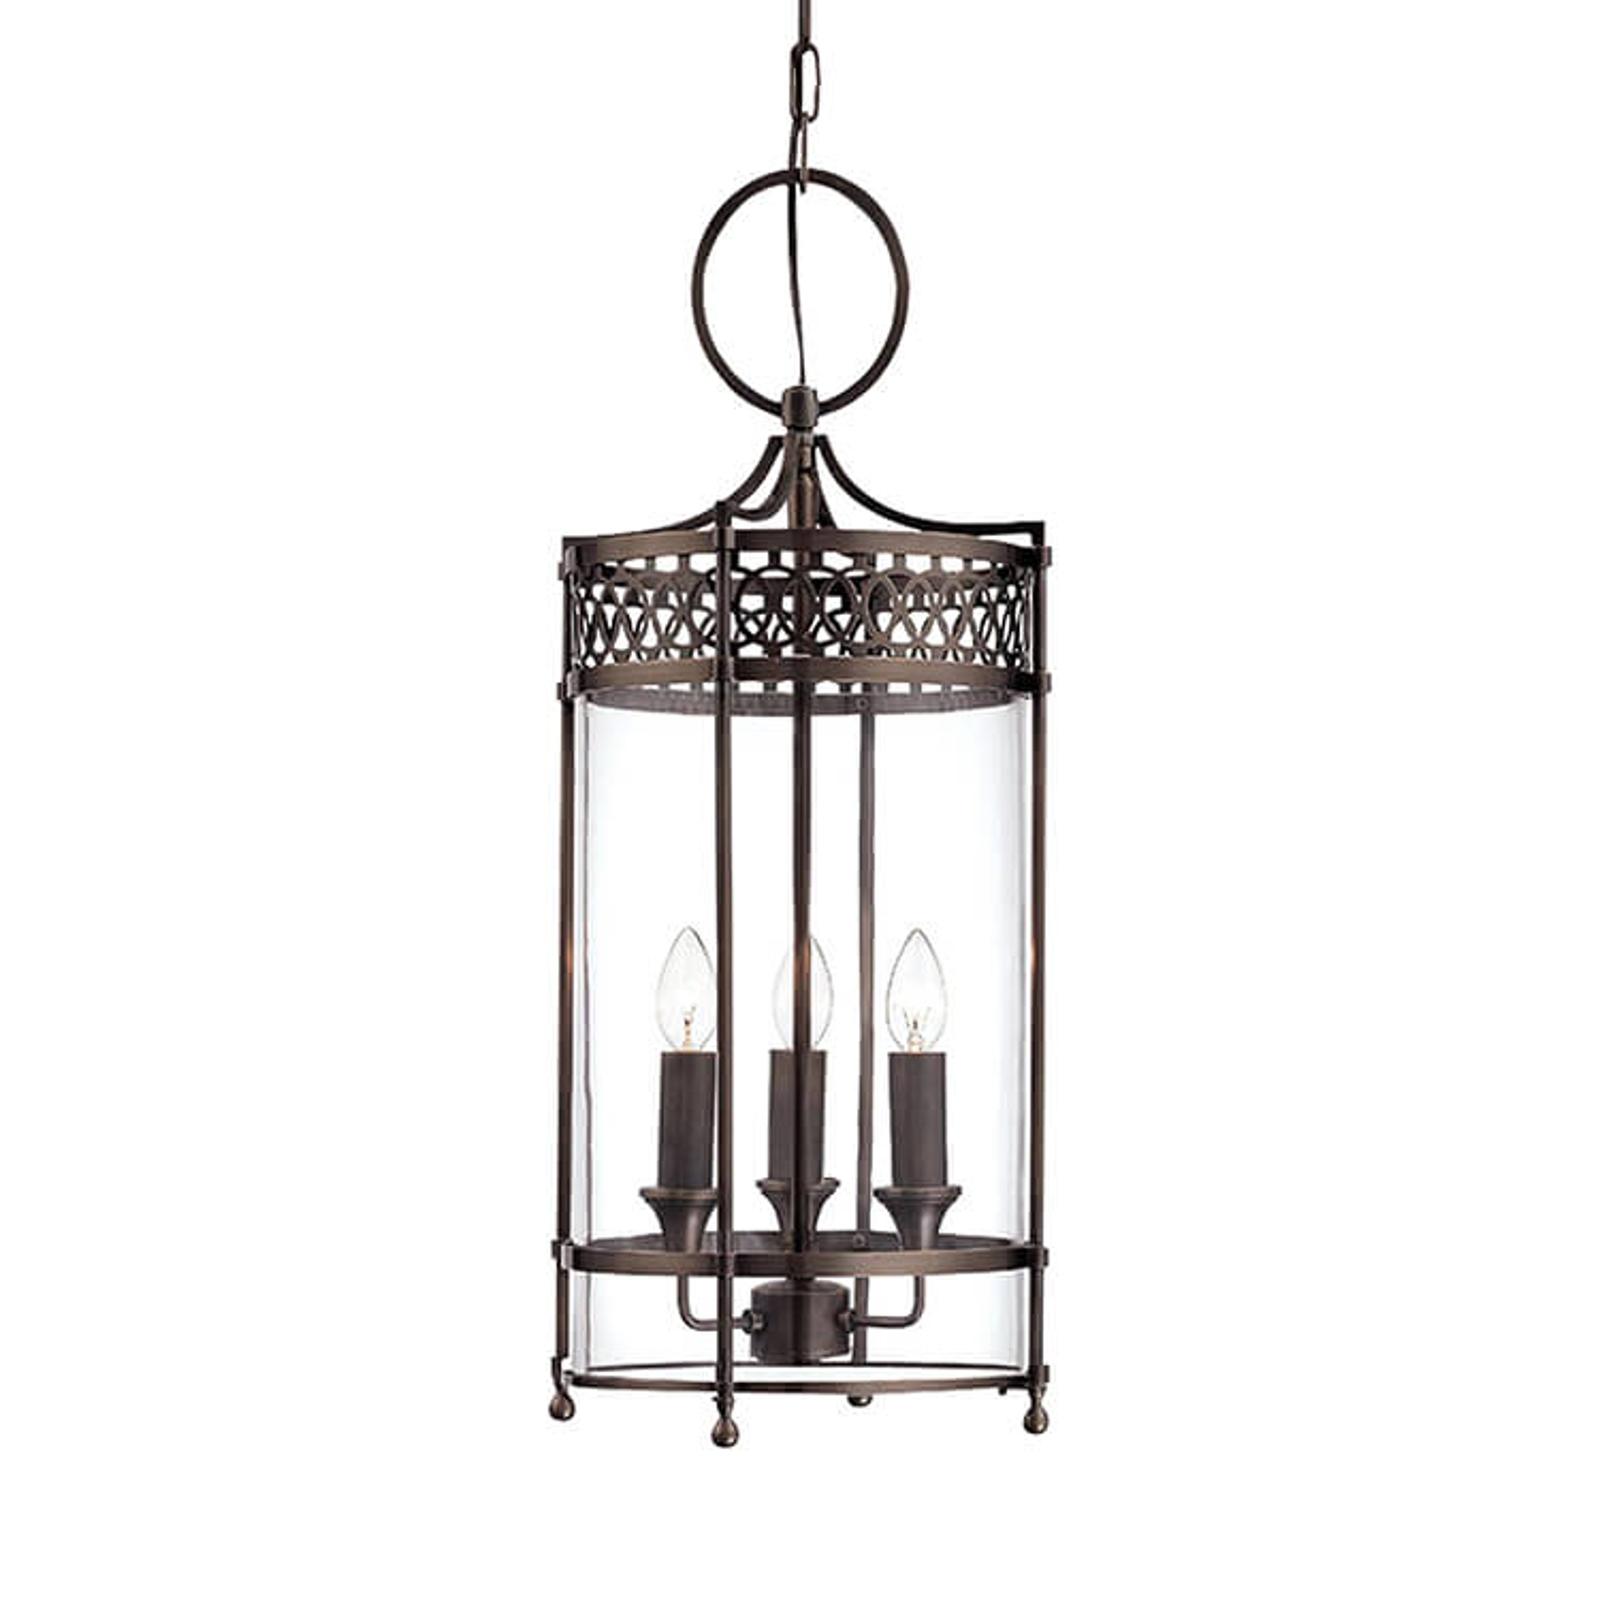 Hanglamp Guildhall, lantaarnvorm in brons